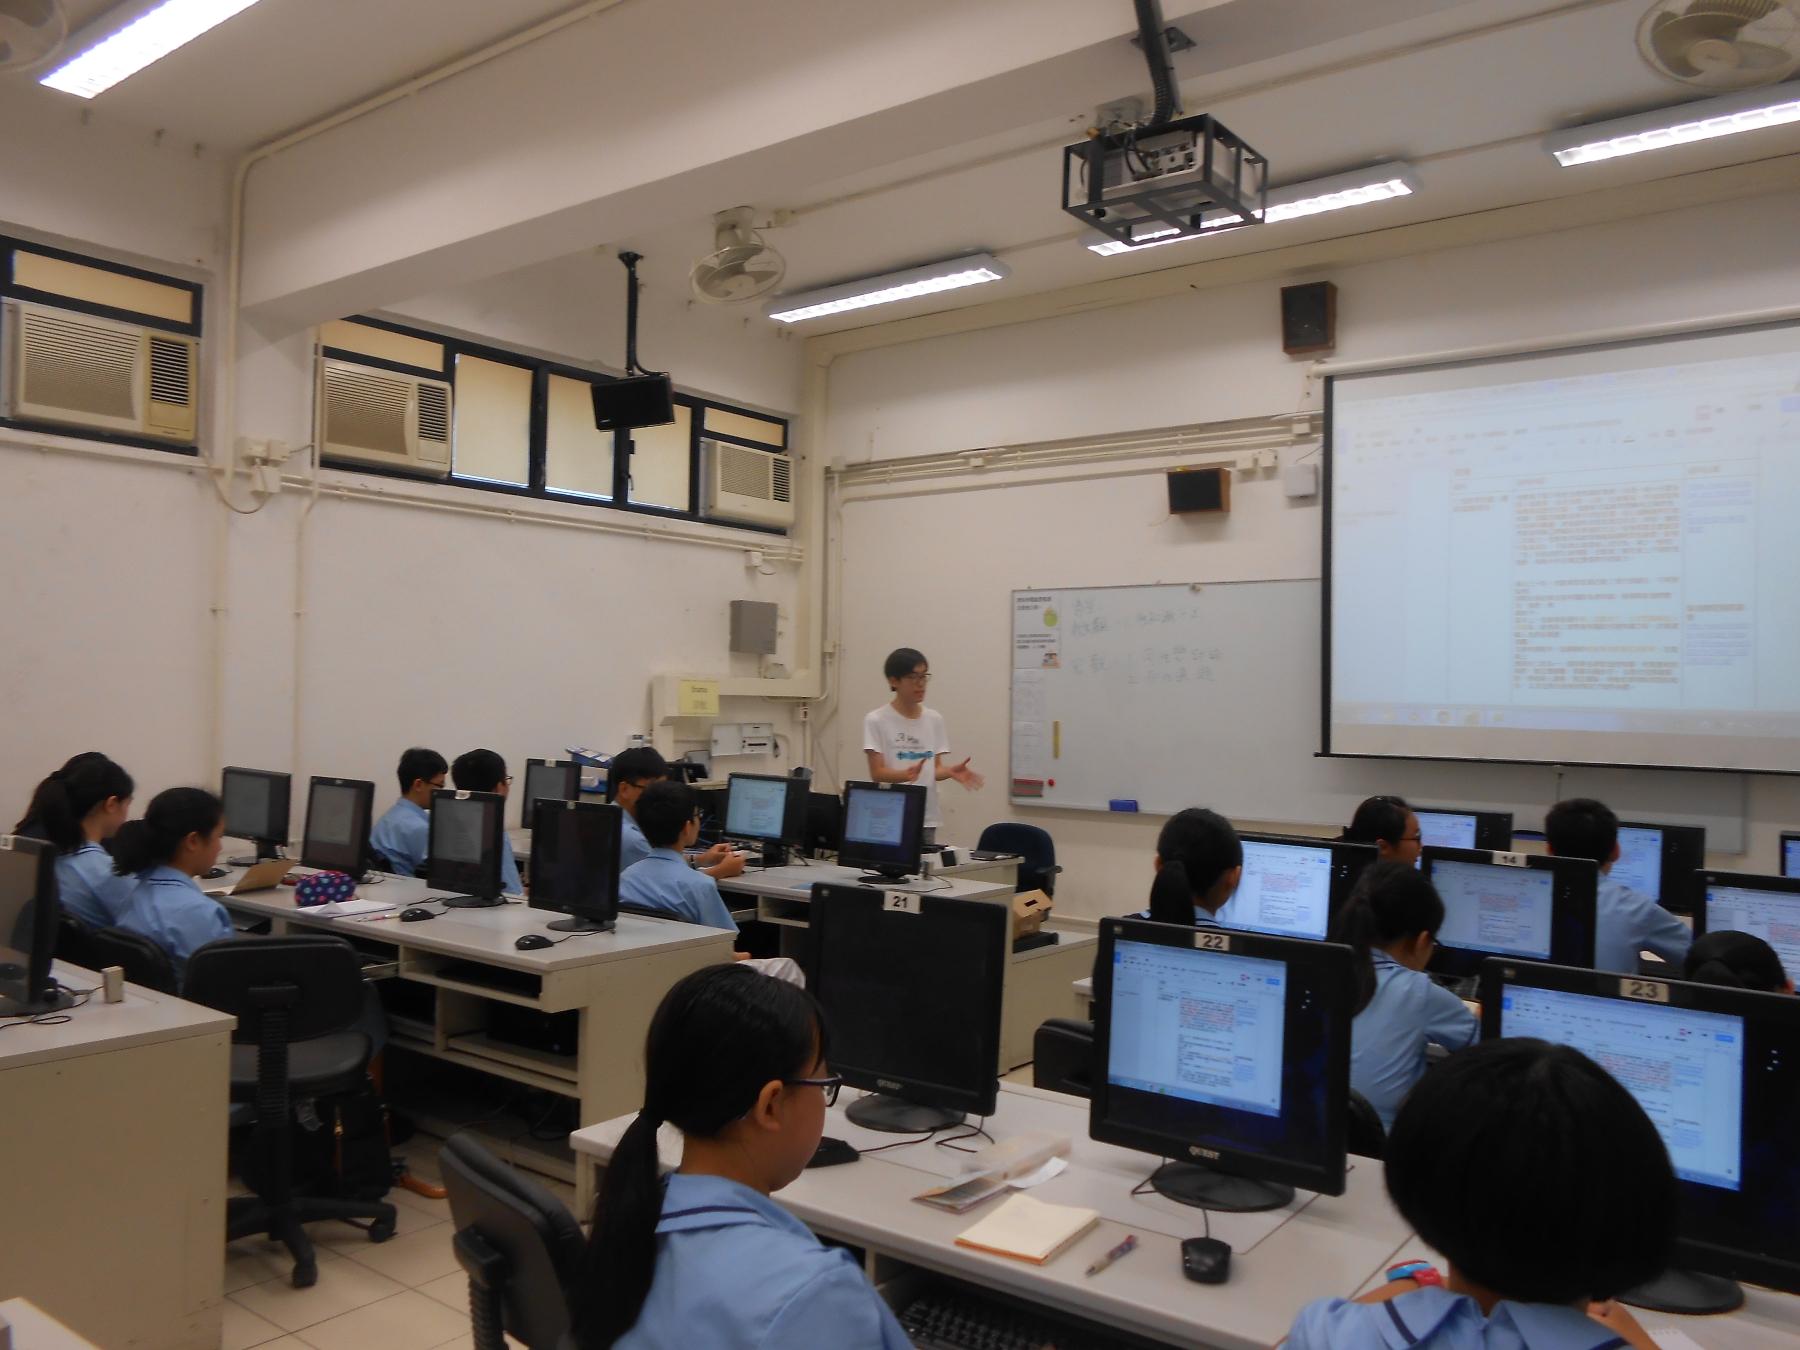 http://www.npc.edu.hk/sites/default/files/dscn0922.jpg